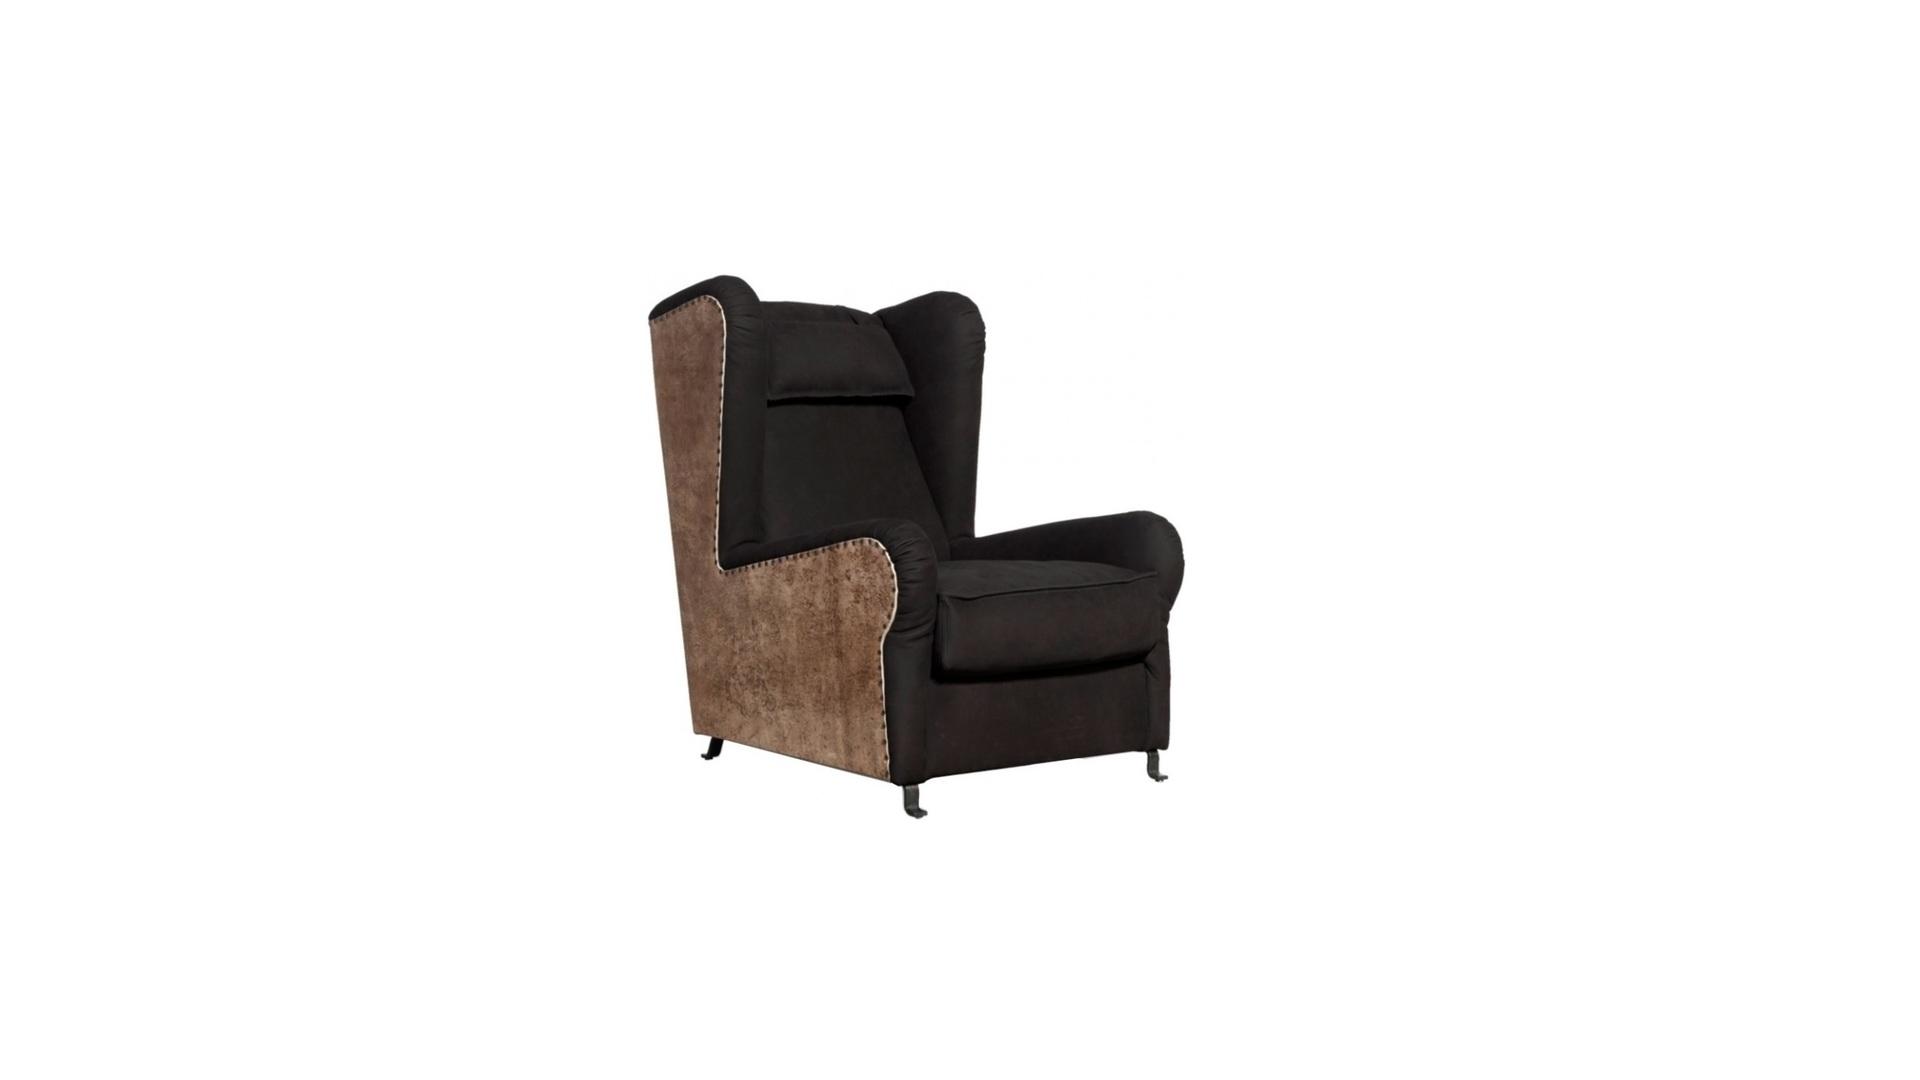 Baxter Pochette armchair2.jpg